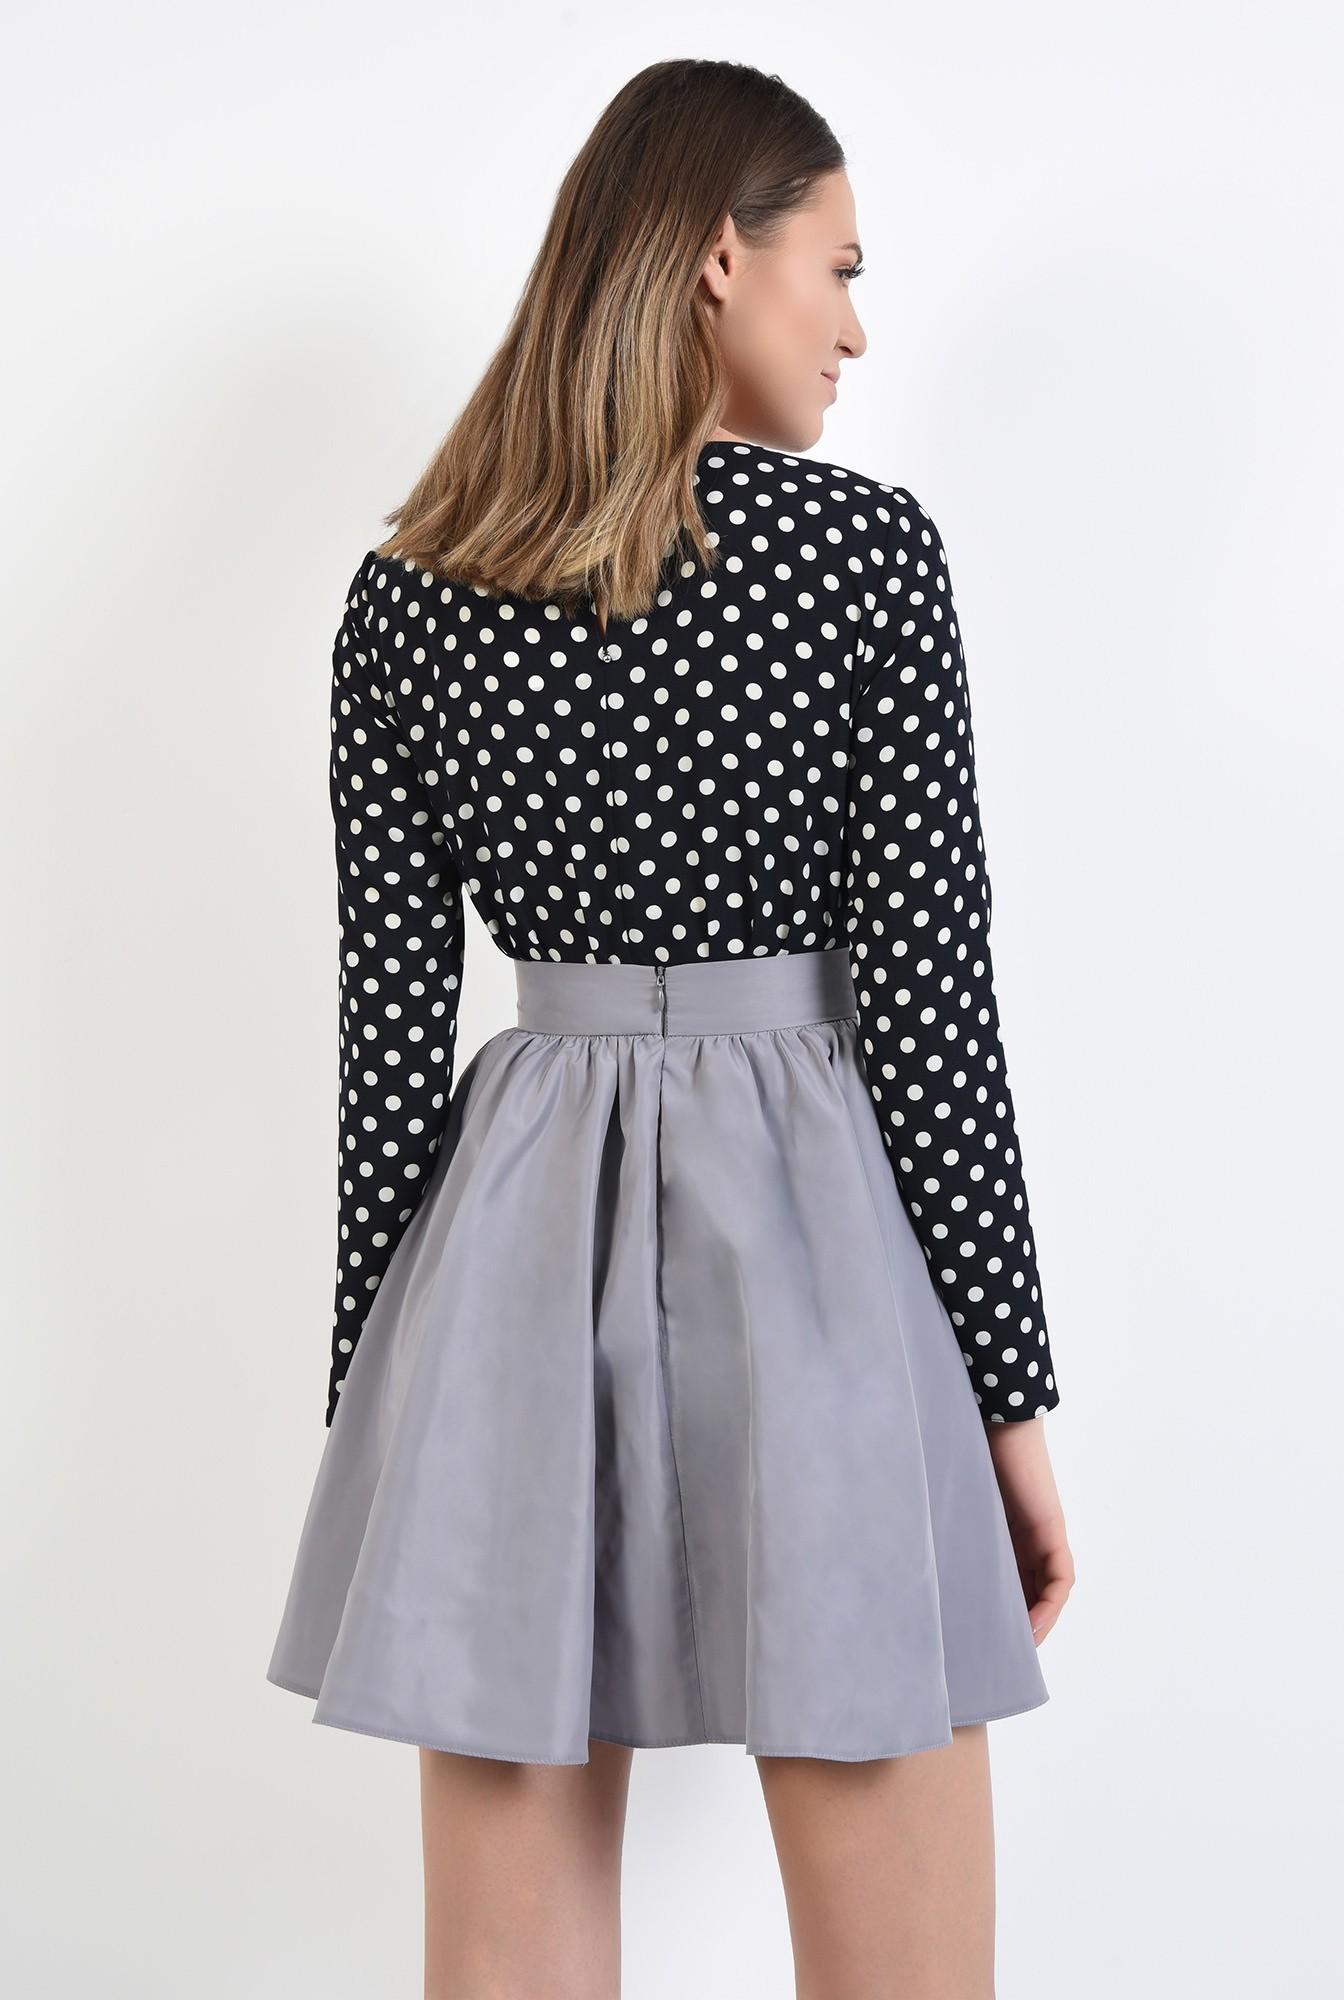 2 - 360 - bluza de zi, cu imprimeu, funda aplicata, maneci drepte